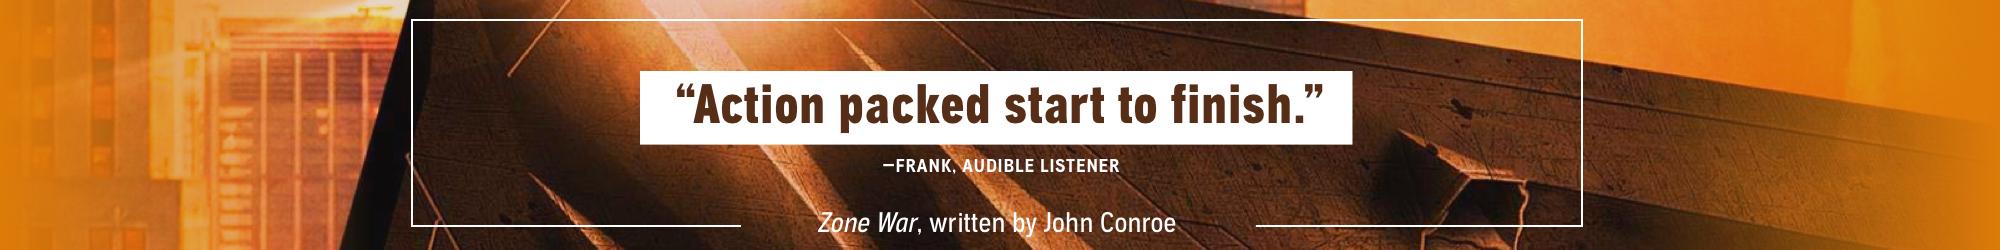 Zone War by John Conroe